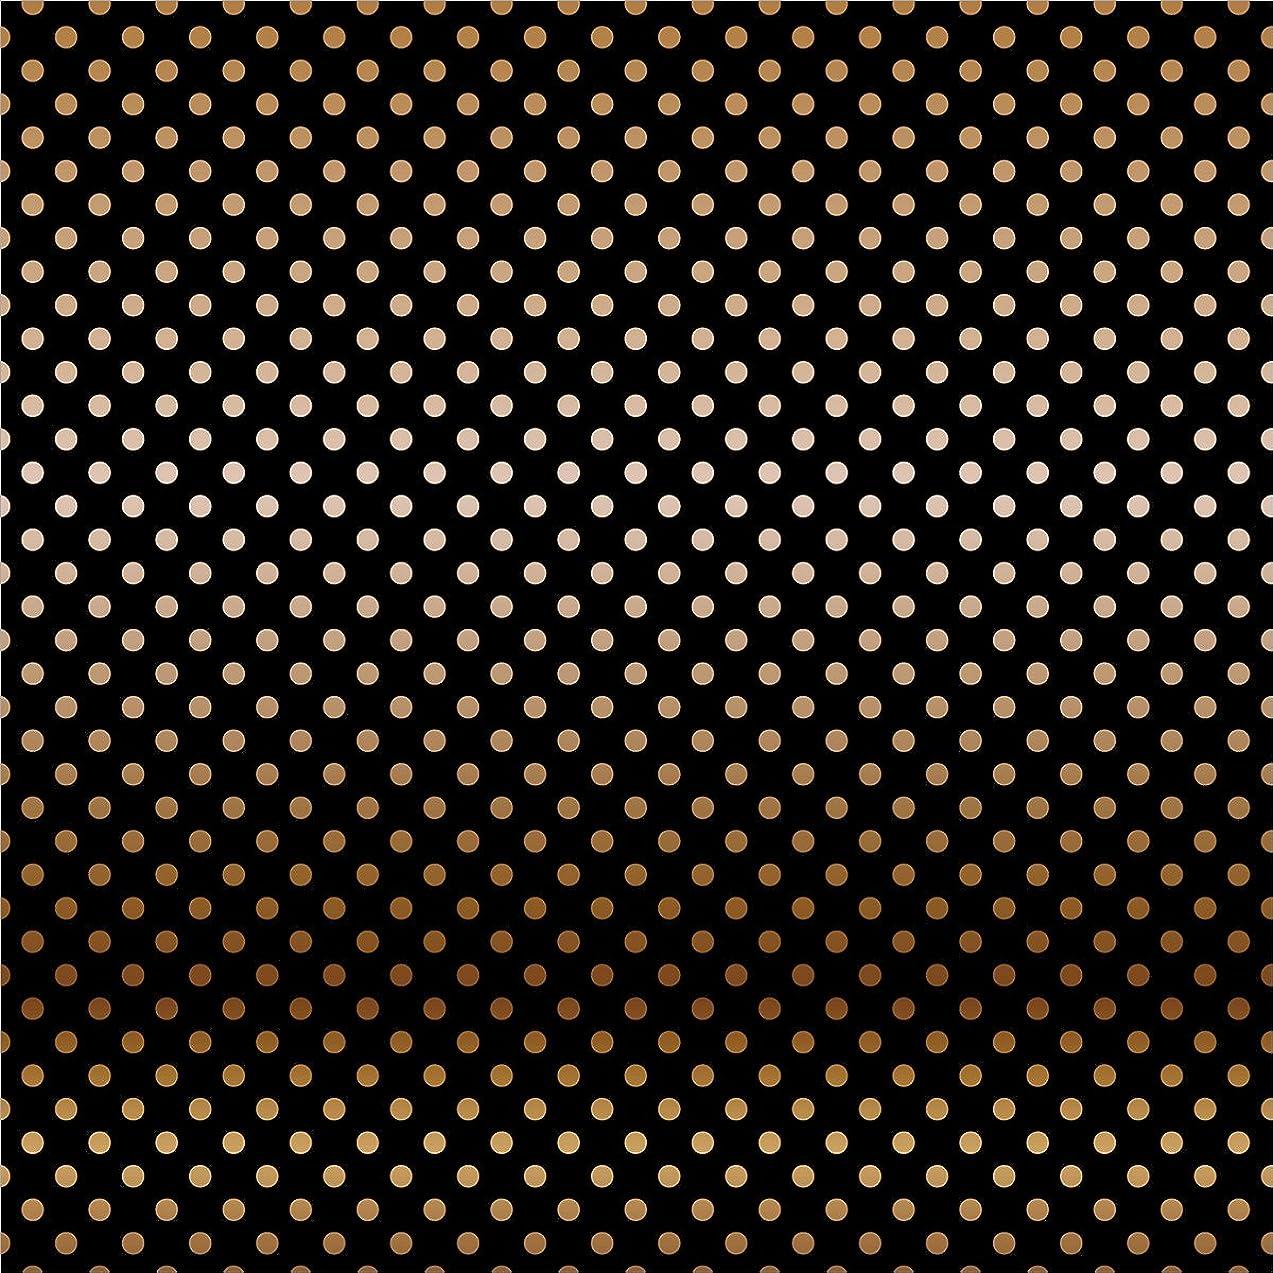 Echo Park Paper CBFC306 Foiled Dots & Stripes Cardstock (15 Sheets Per Pack), 12